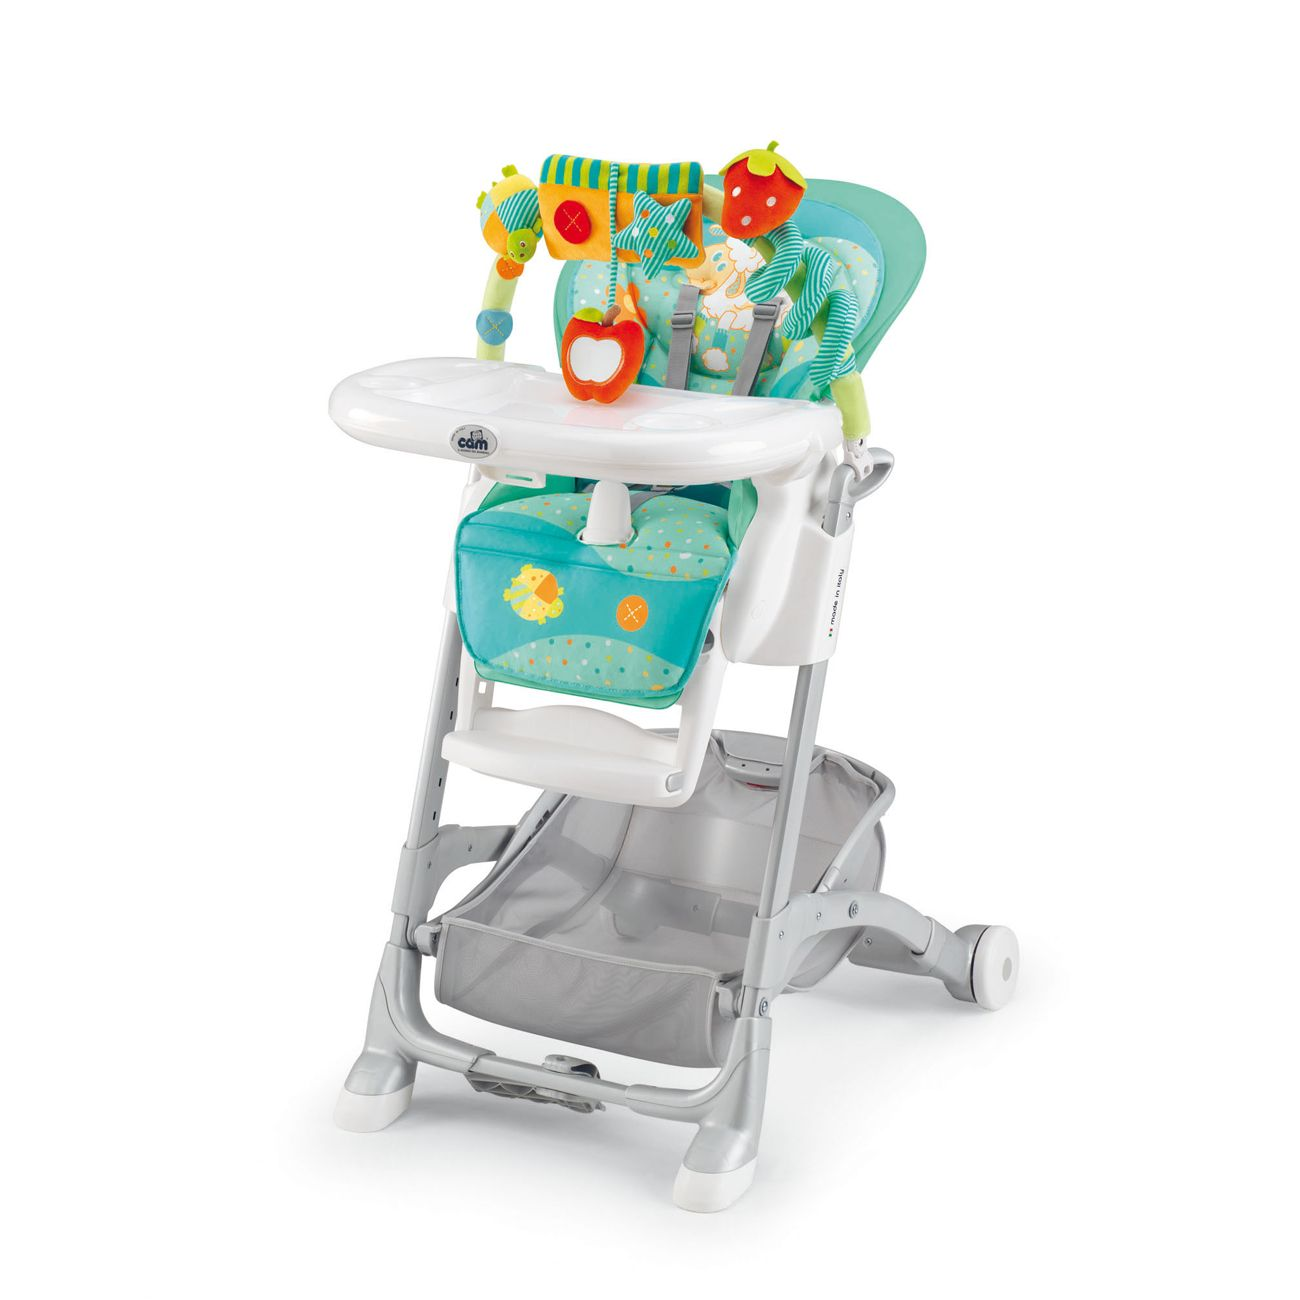 Seggiolone Cam Istante 216 Pecora High chair, Swinging